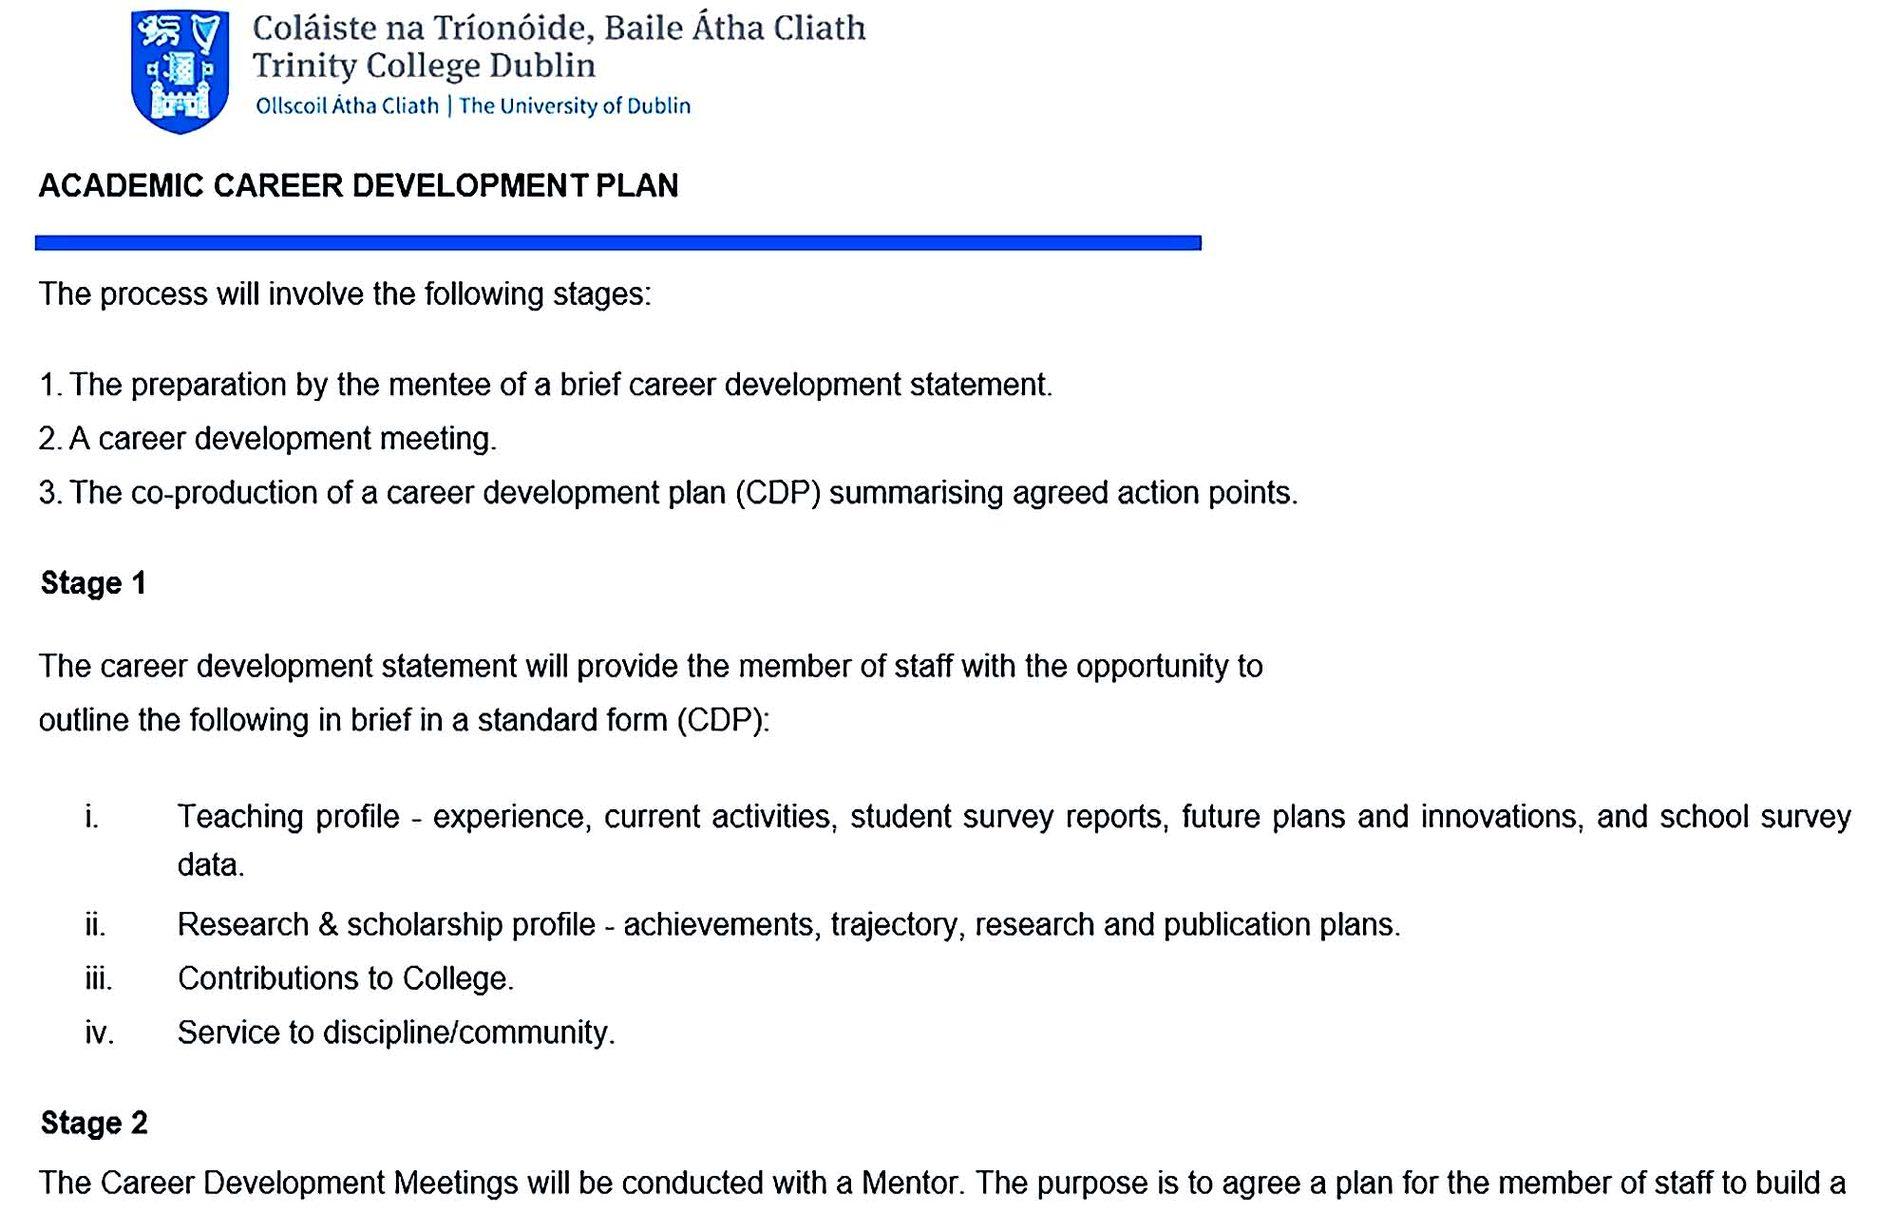 academic career development plan guideline